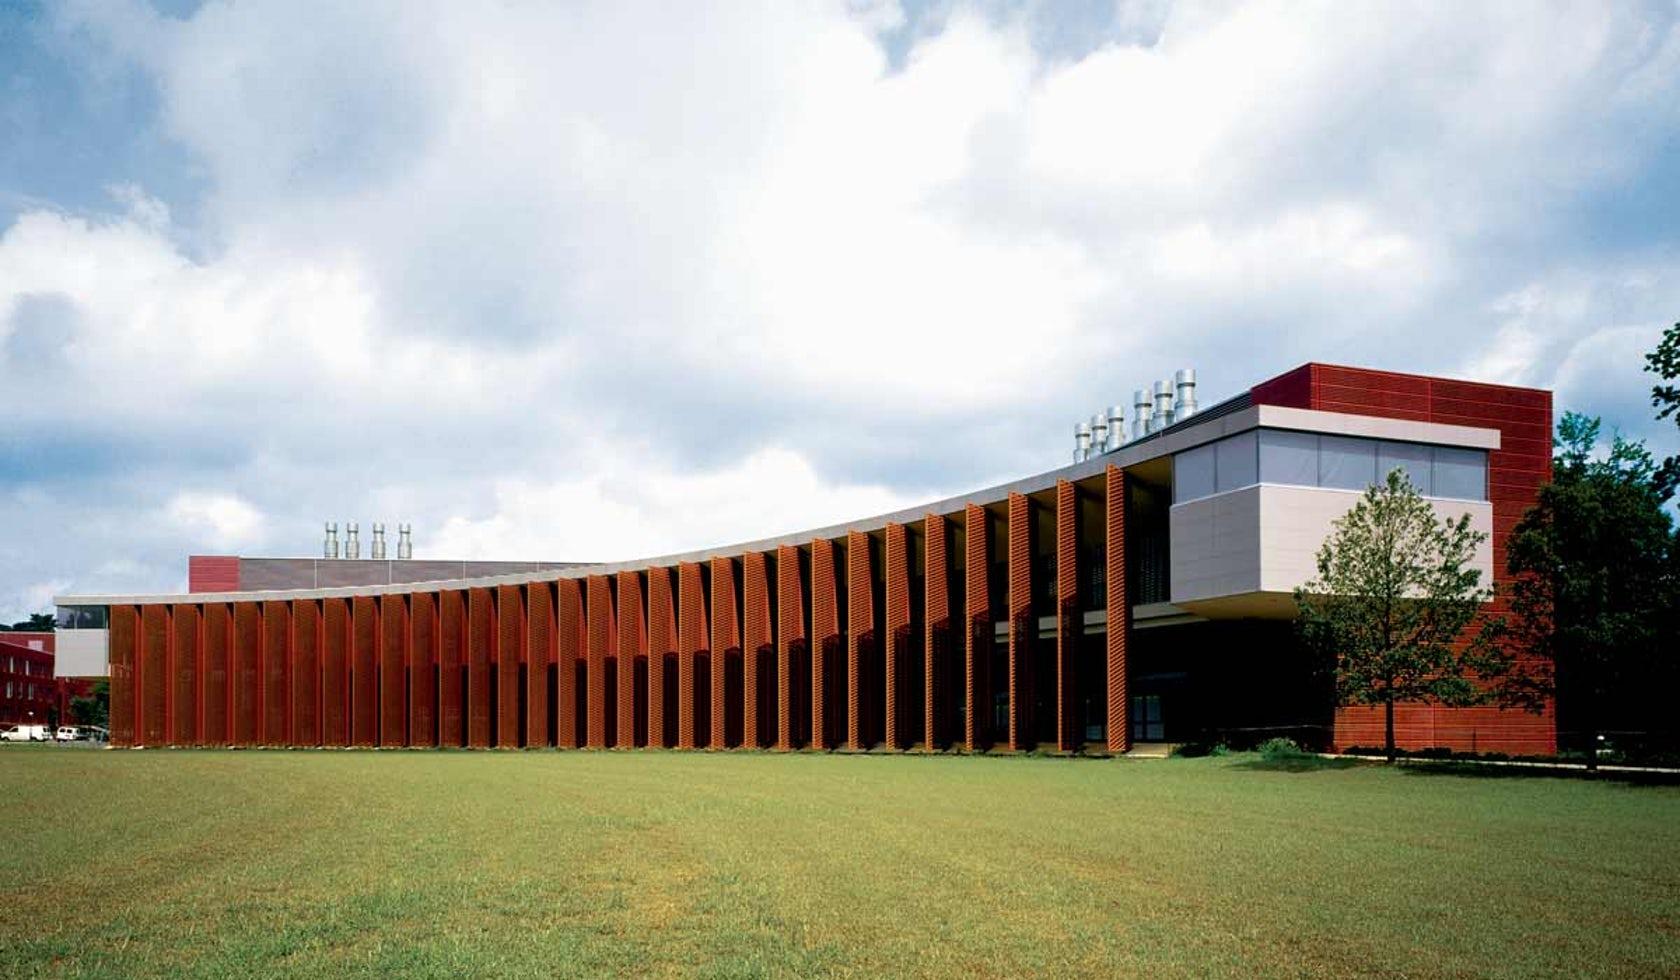 Image of Icahn Laboratory courtesy of Rafael Viñoly Architects.